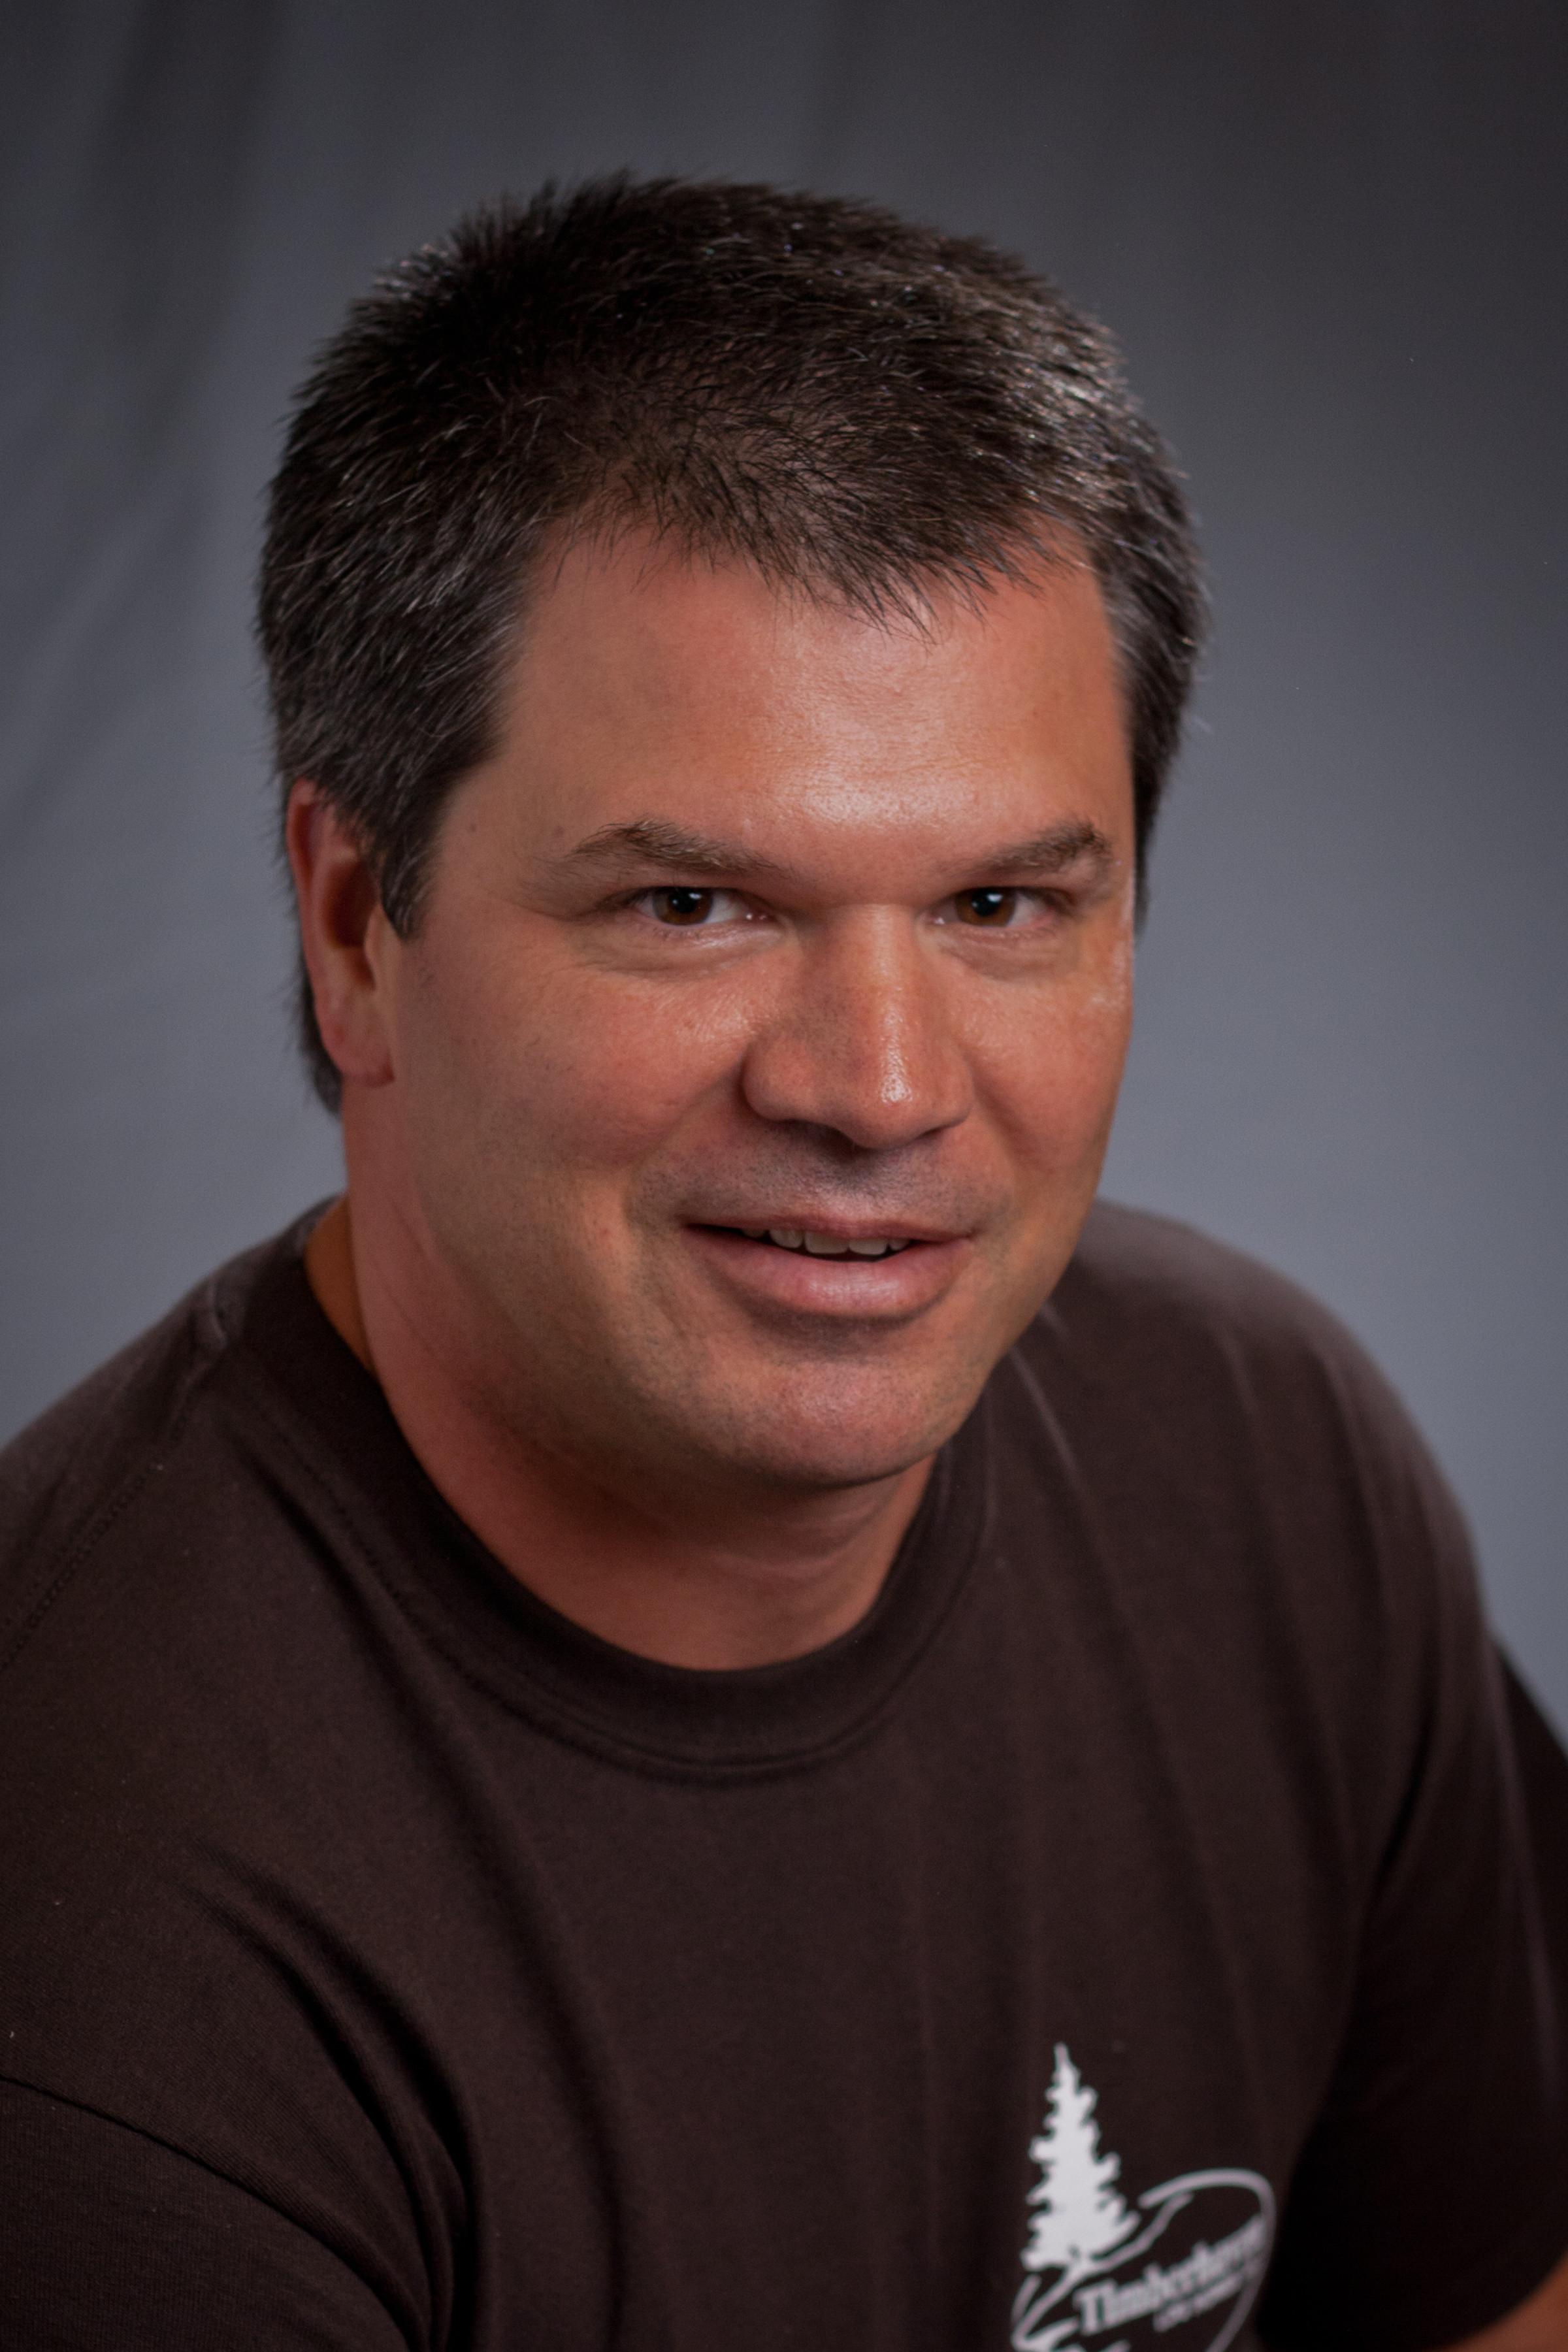 Timberhaven's Employee Spotlight Shines on Andrew Harter